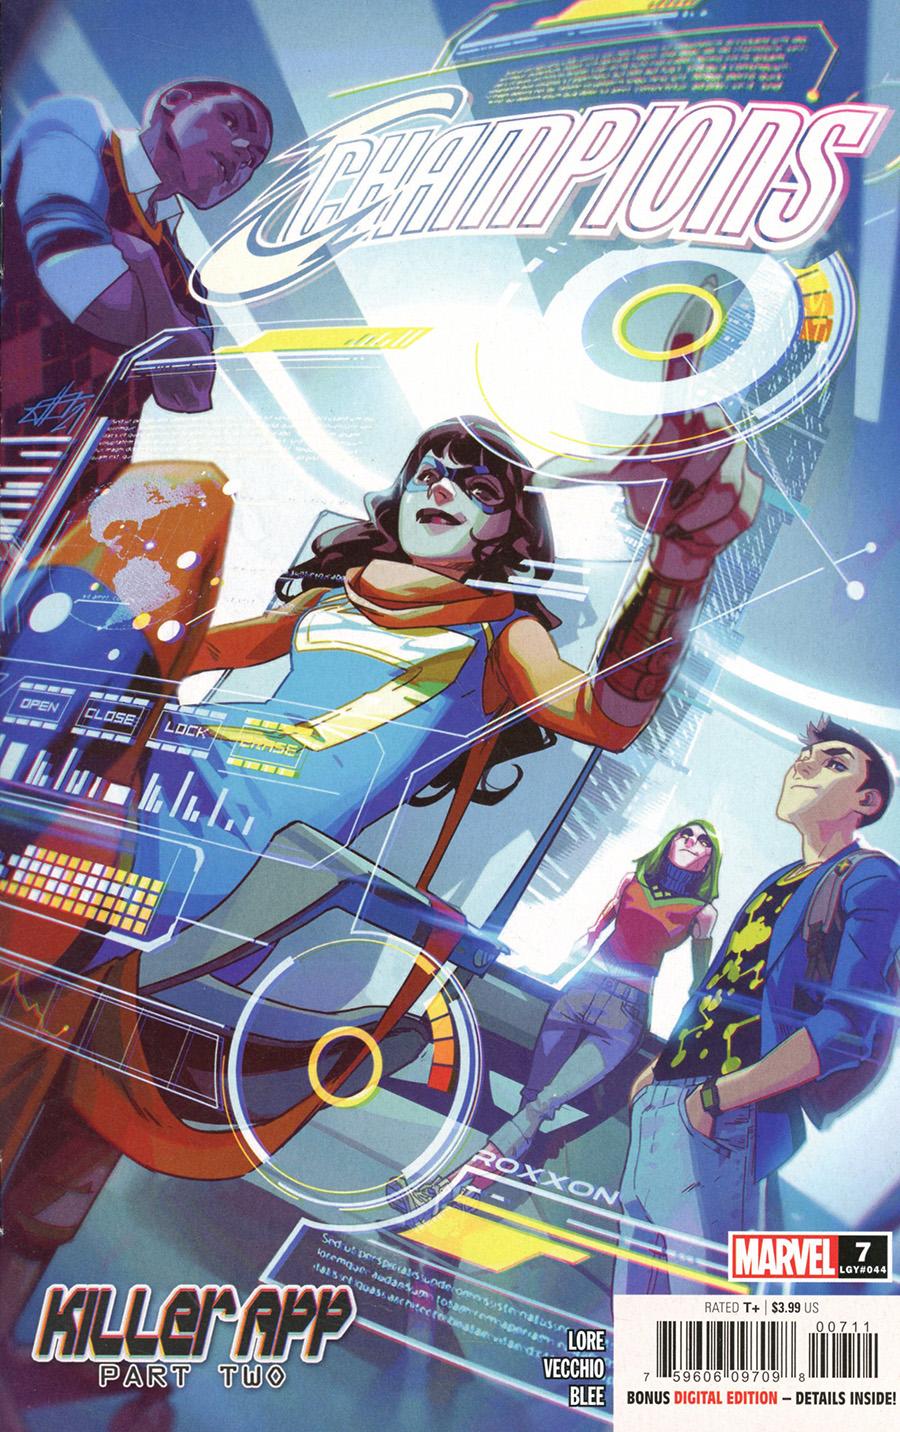 Champions (Marvel) Vol 4 #7